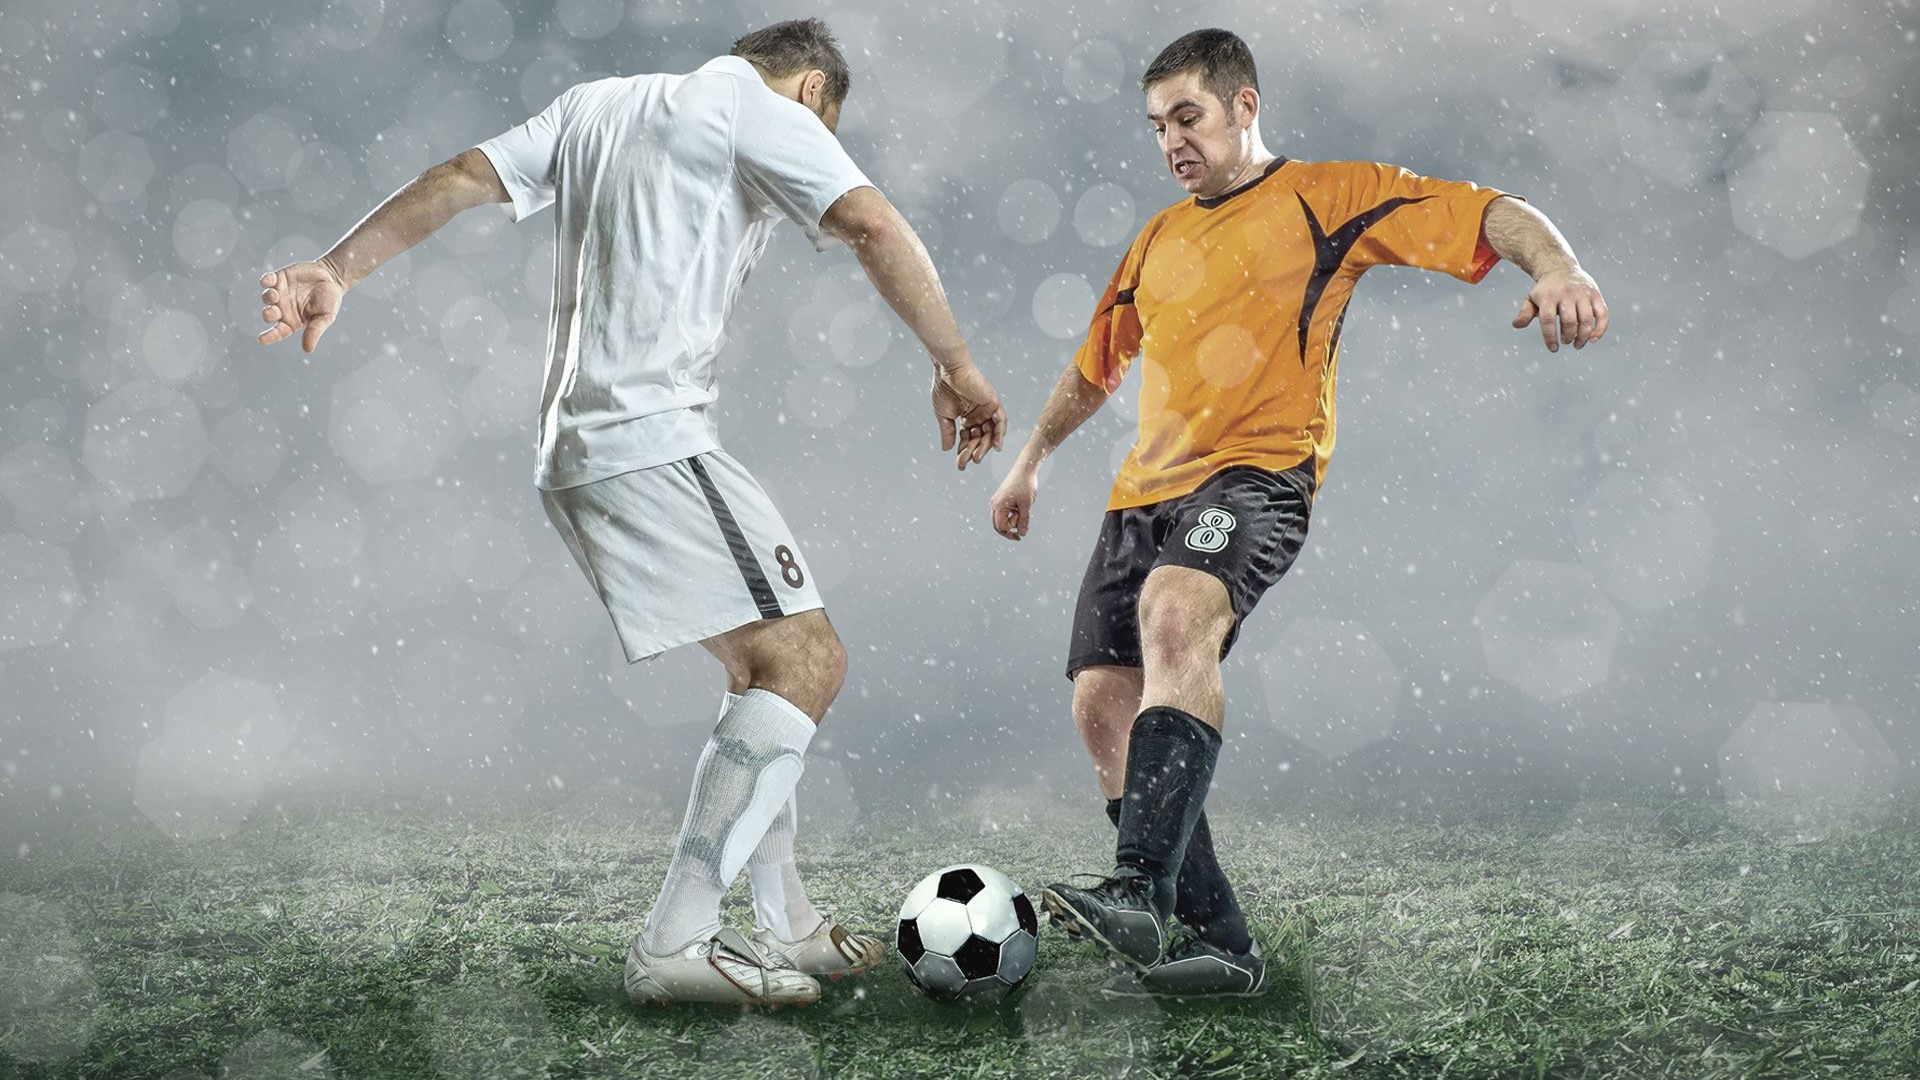 watch-edinburgh-vs-dragons-rugby-live